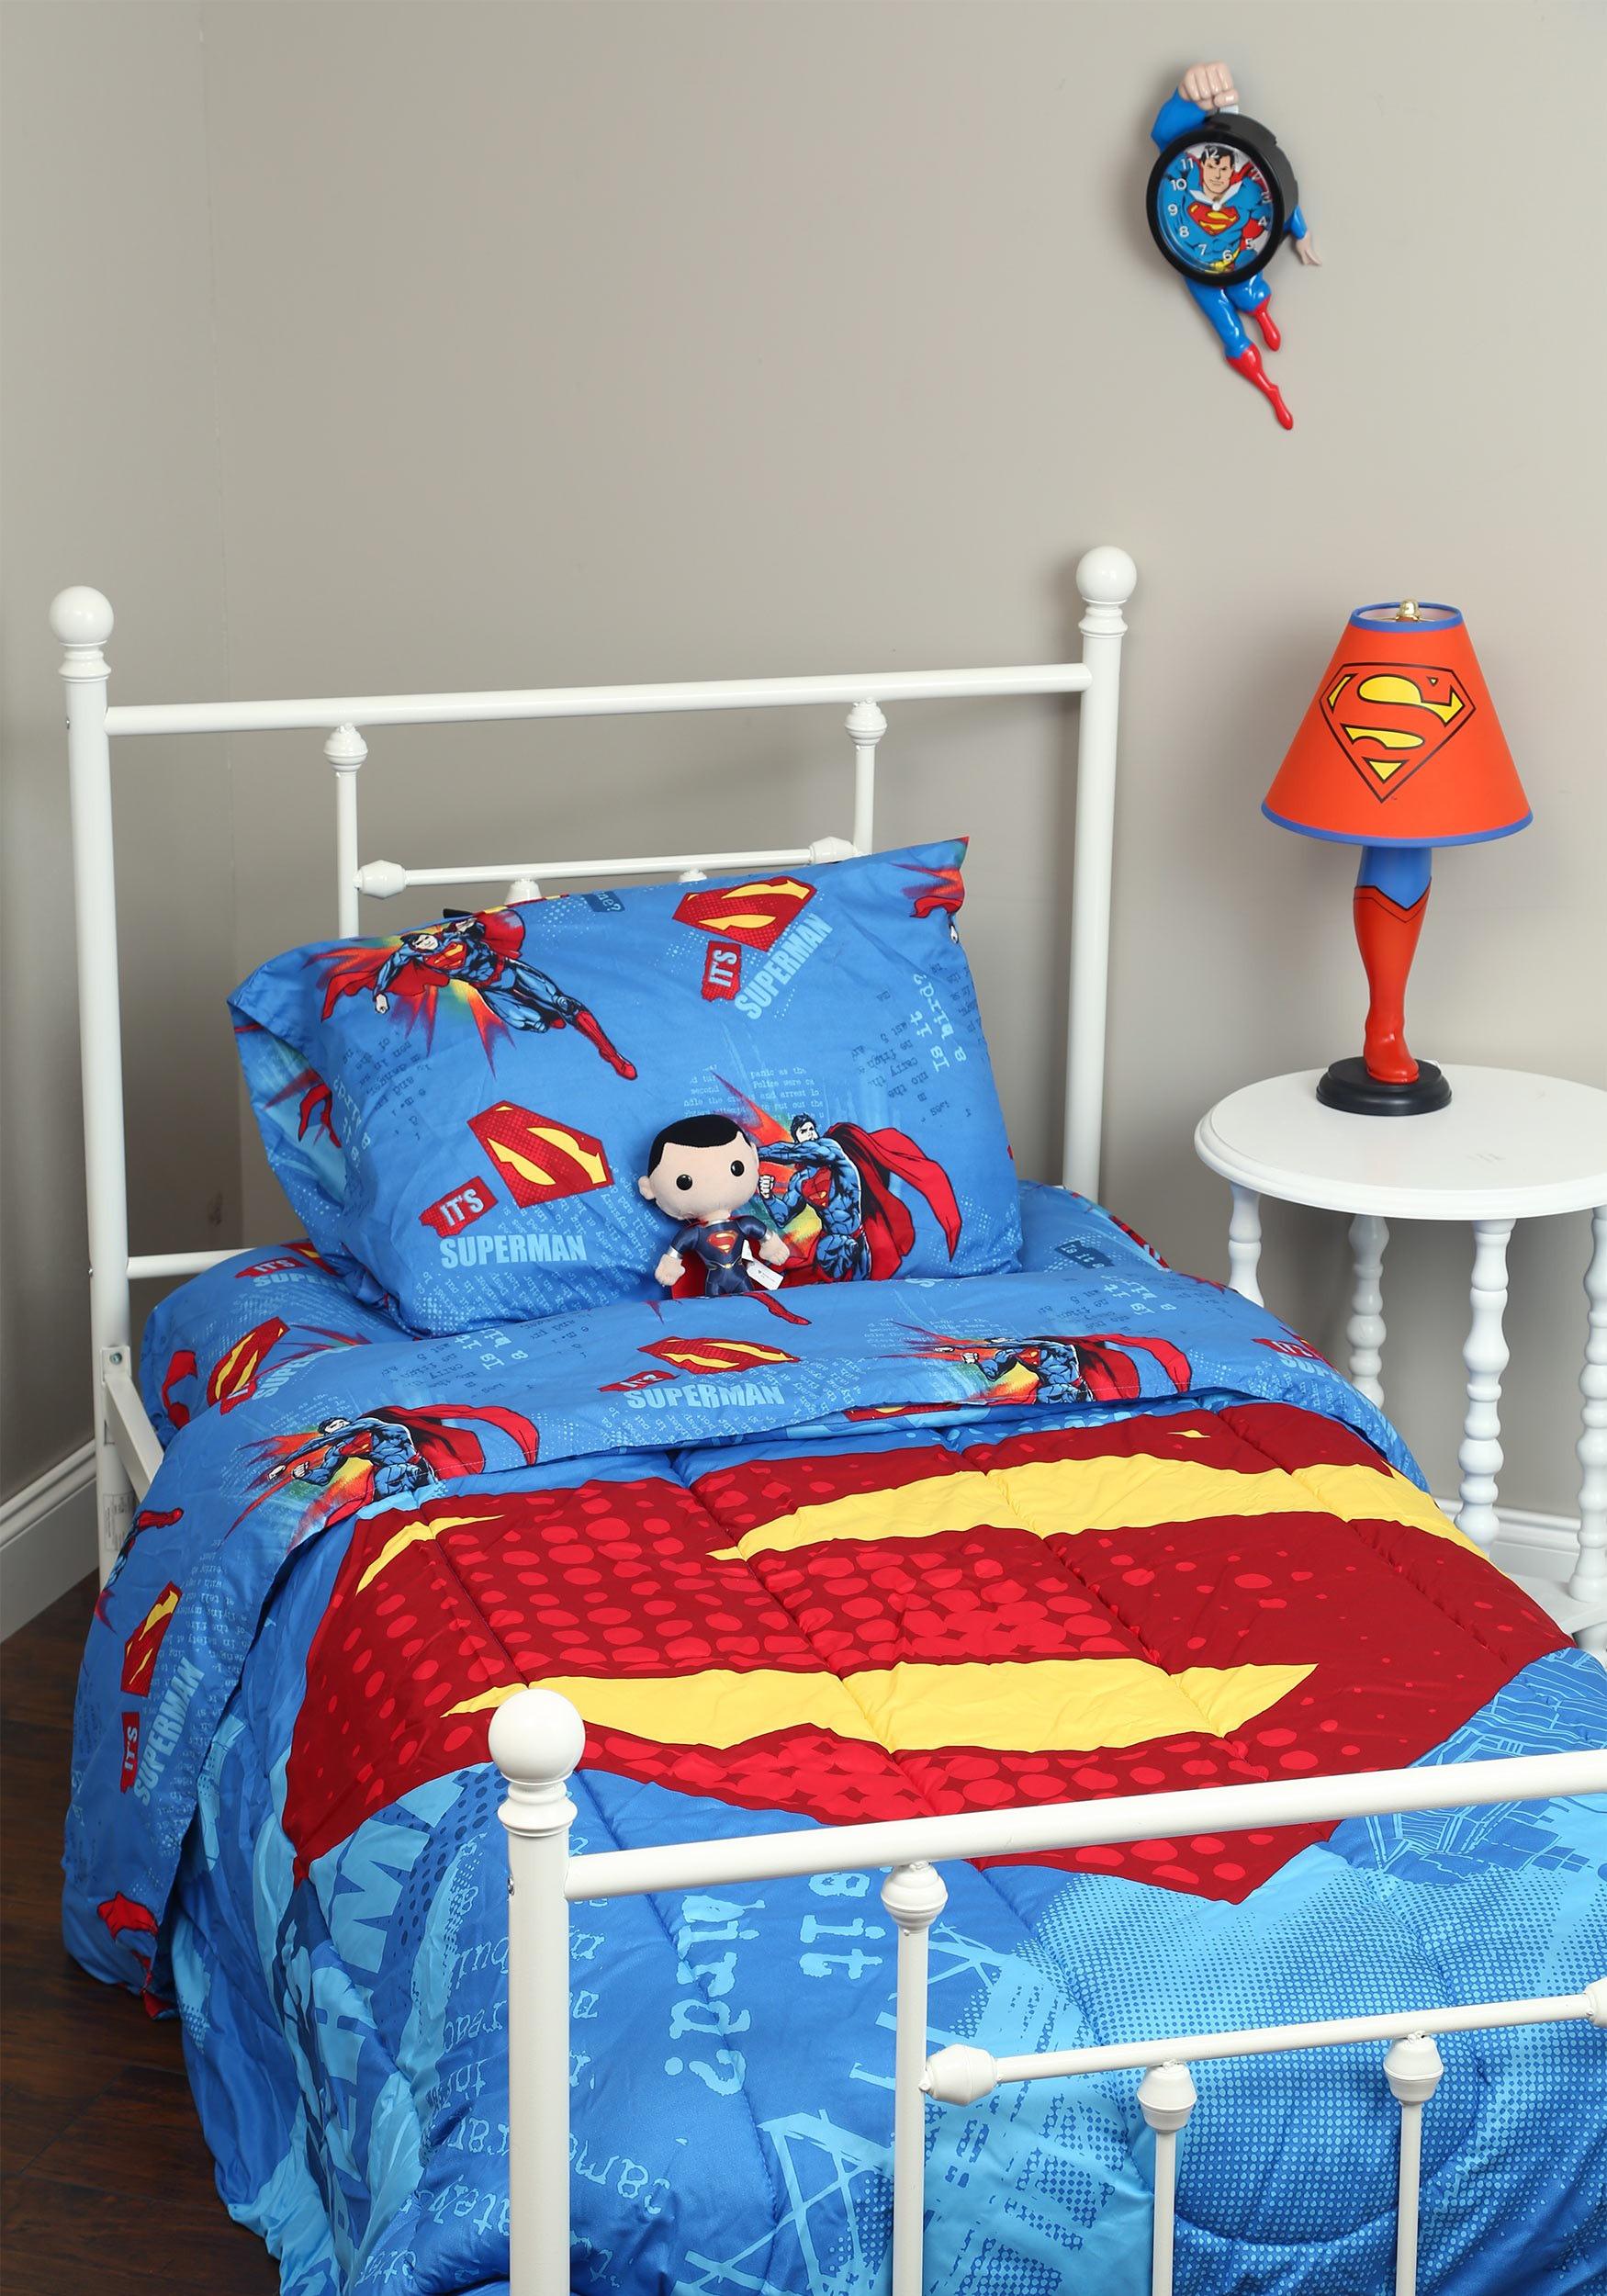 Superman Full Size Bedding Set